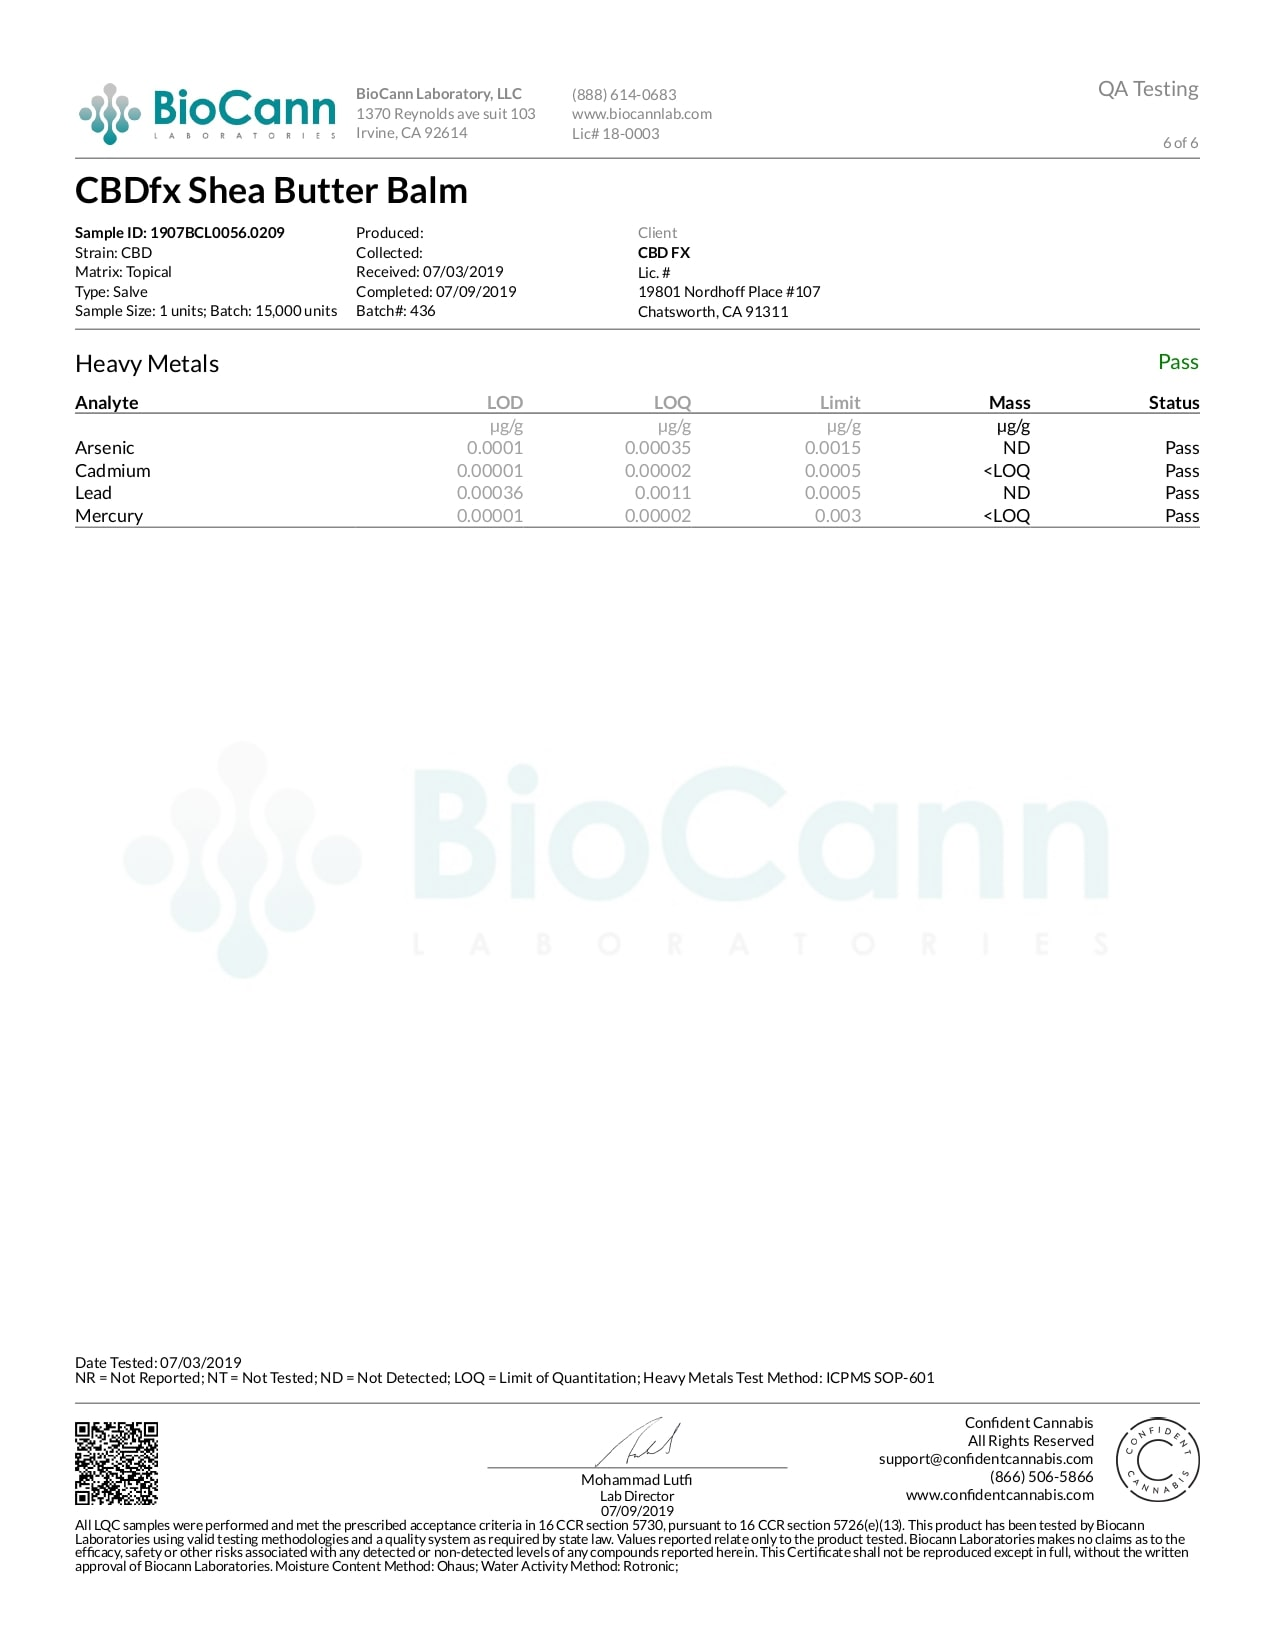 CBDfx CBD Balm Lab Report Moisturizing 150mg